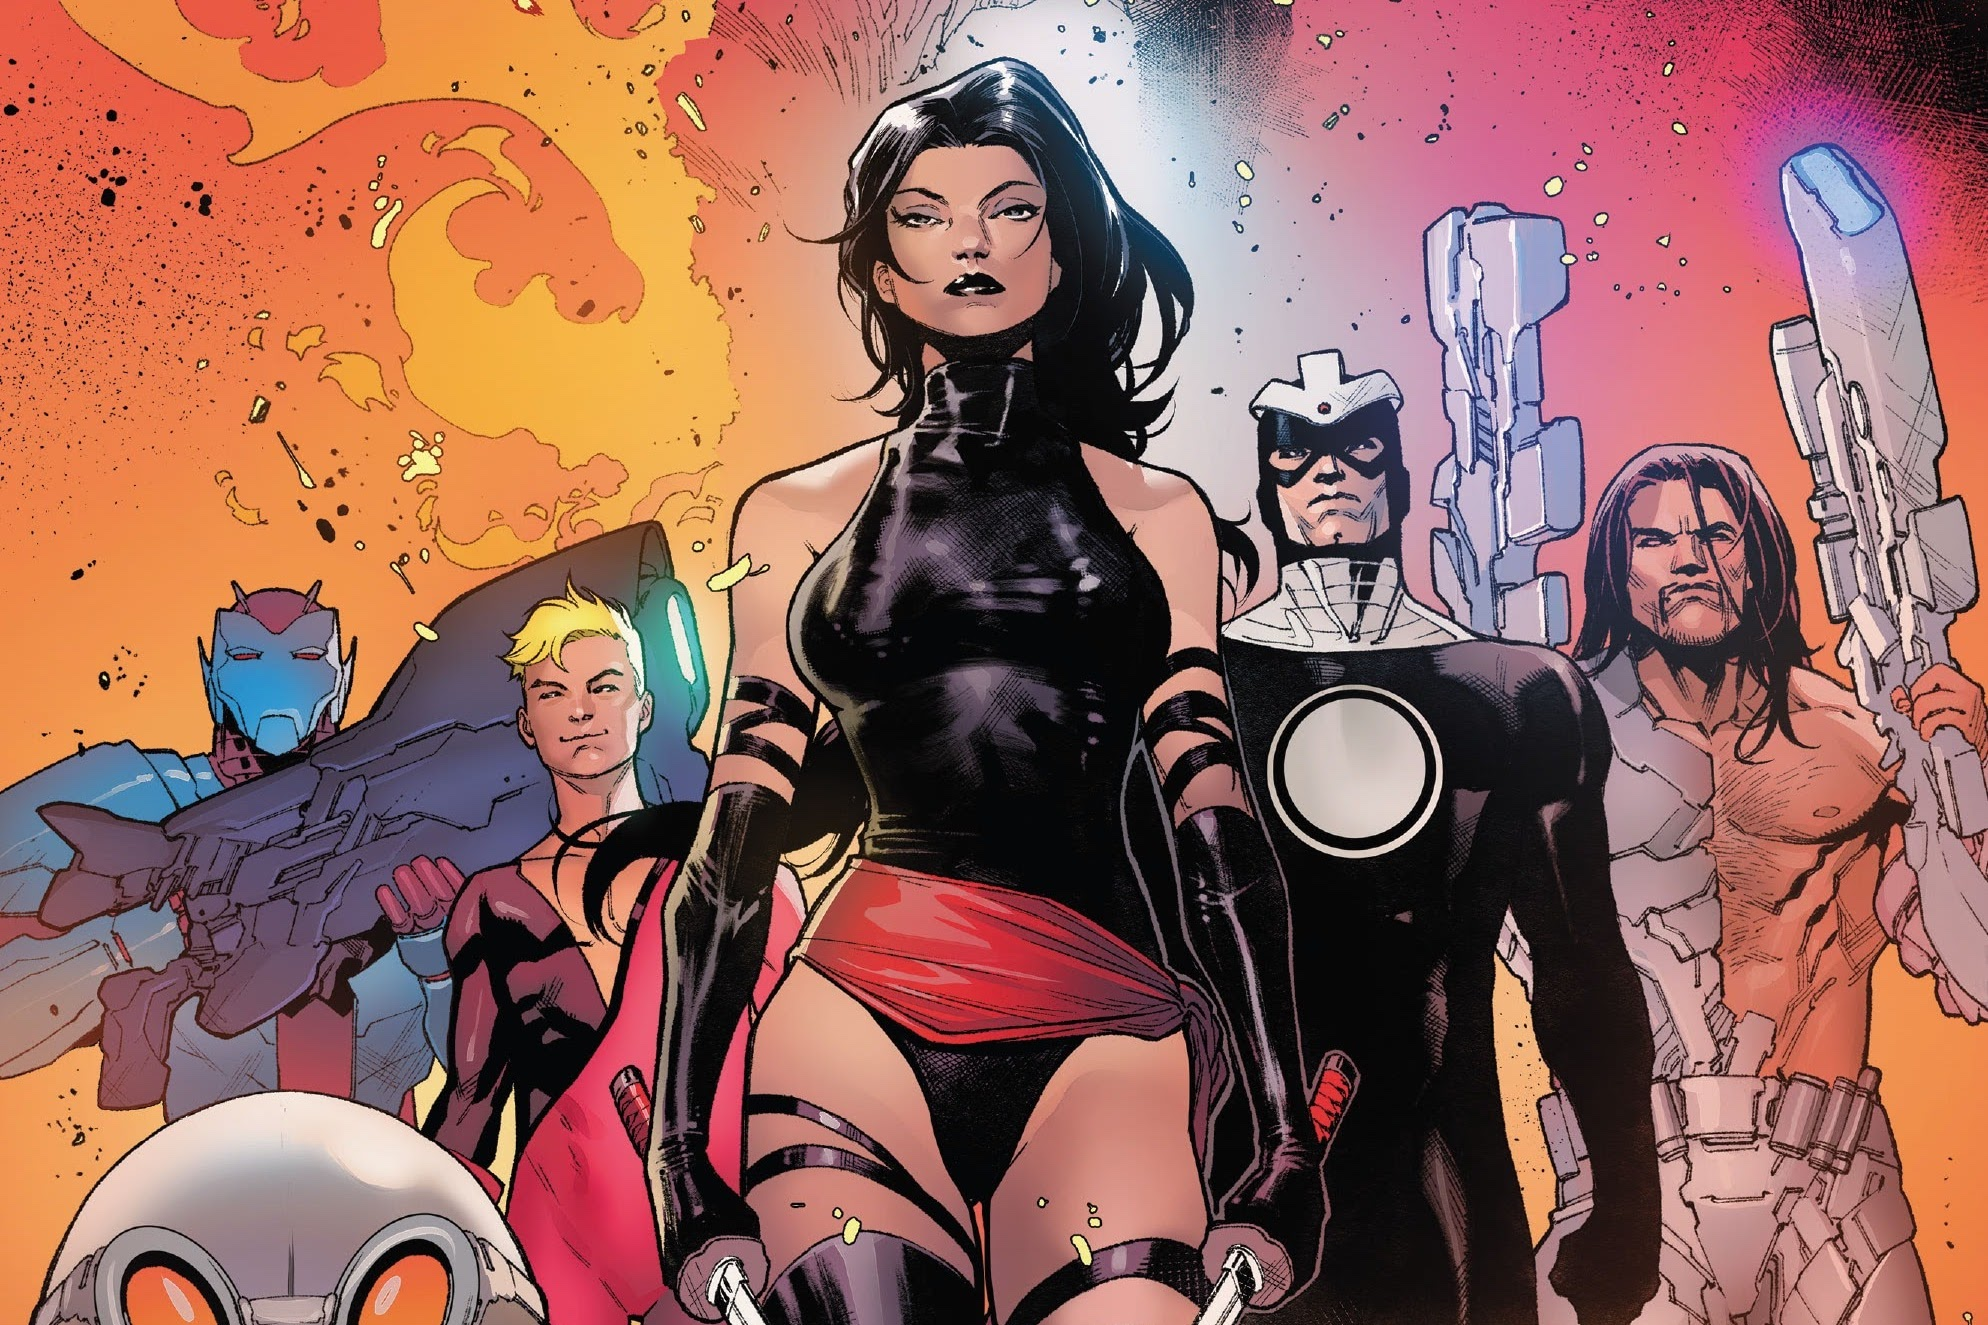 Havok, Orphan-Maker, Nanny, Wild Child, Psylocke, Empath, and Greycrow walk towards the camera like badasses on the cover of Hellions #6, Marvel Comics (2020).